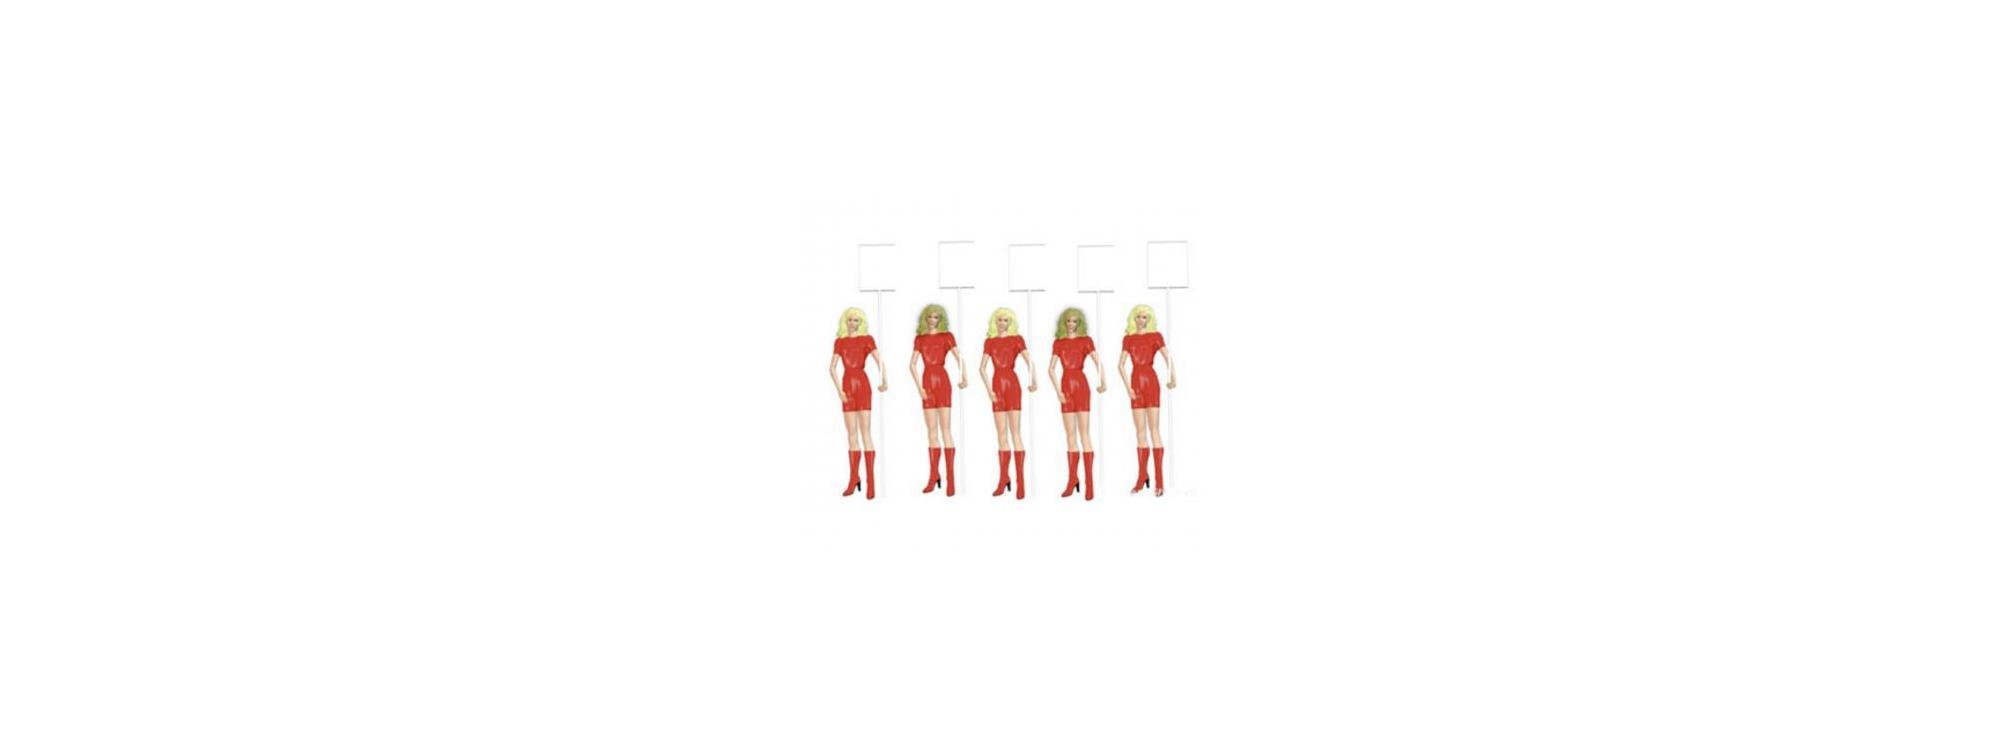 Carrera Figurensatz Gridgirls 1:32-21113